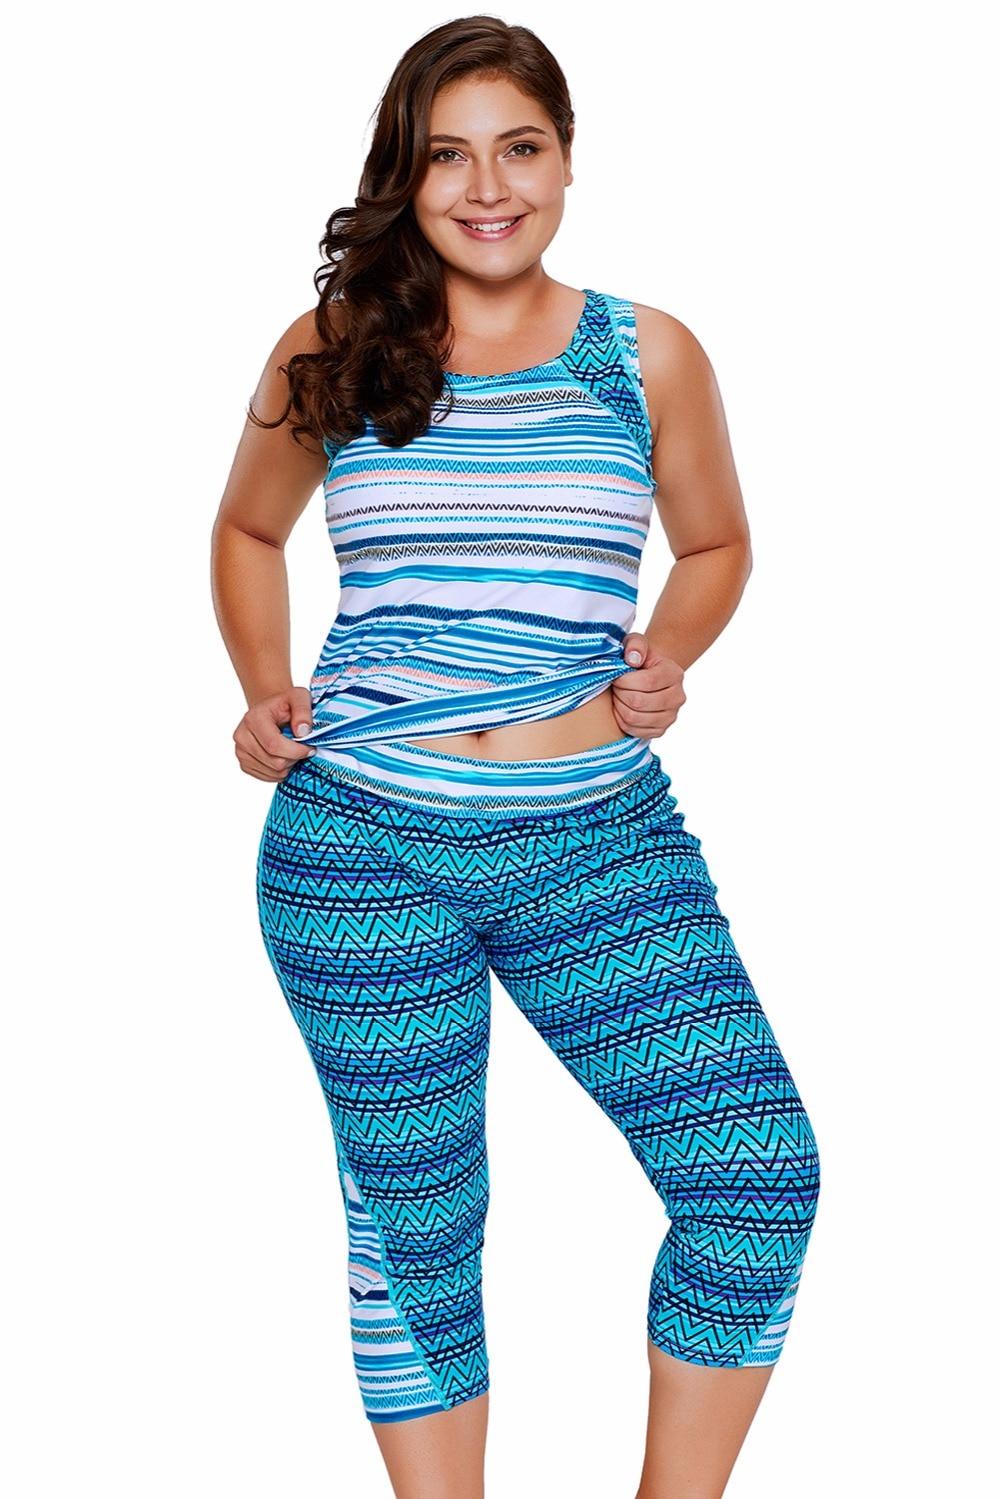 Two Piece Suits Multiple Zigzag Stripes Print Tankini Top and Capris Set Tankini Swimsuit Swimwear Women